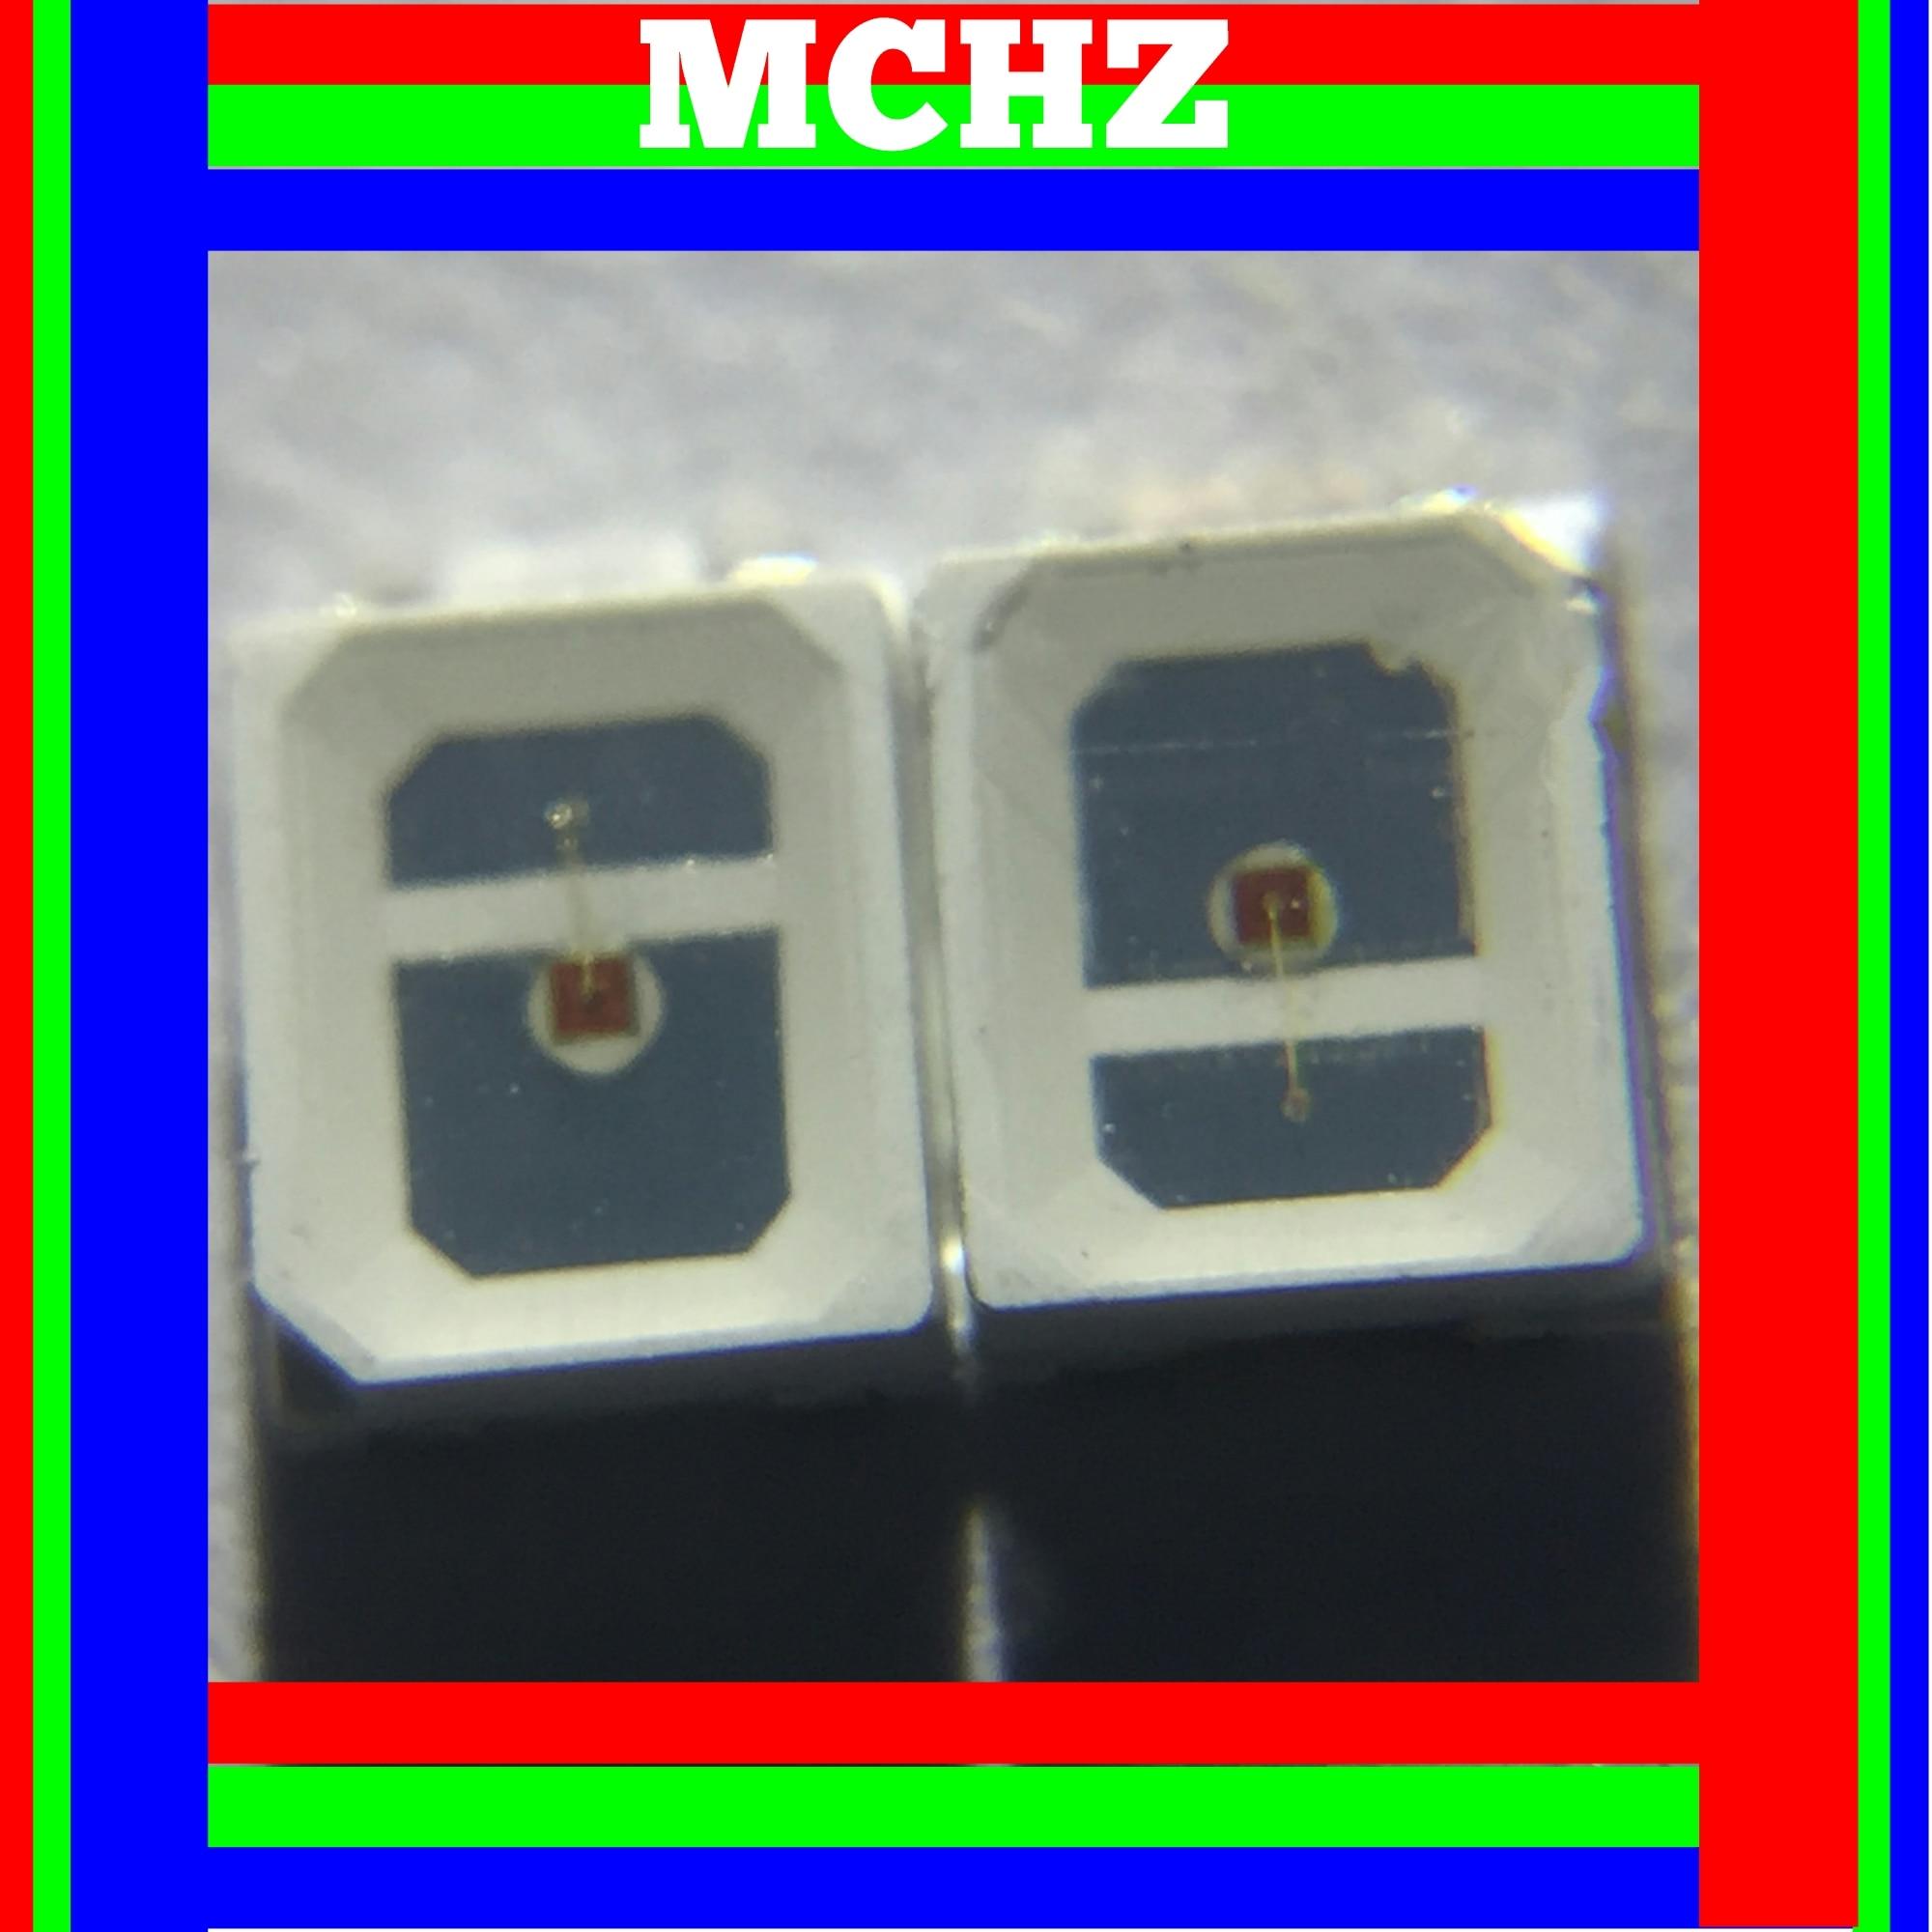 2000pcs 5mm 20000mcd white led Lamp Ultra Bright LED 5MM WHITE LED light Lamp